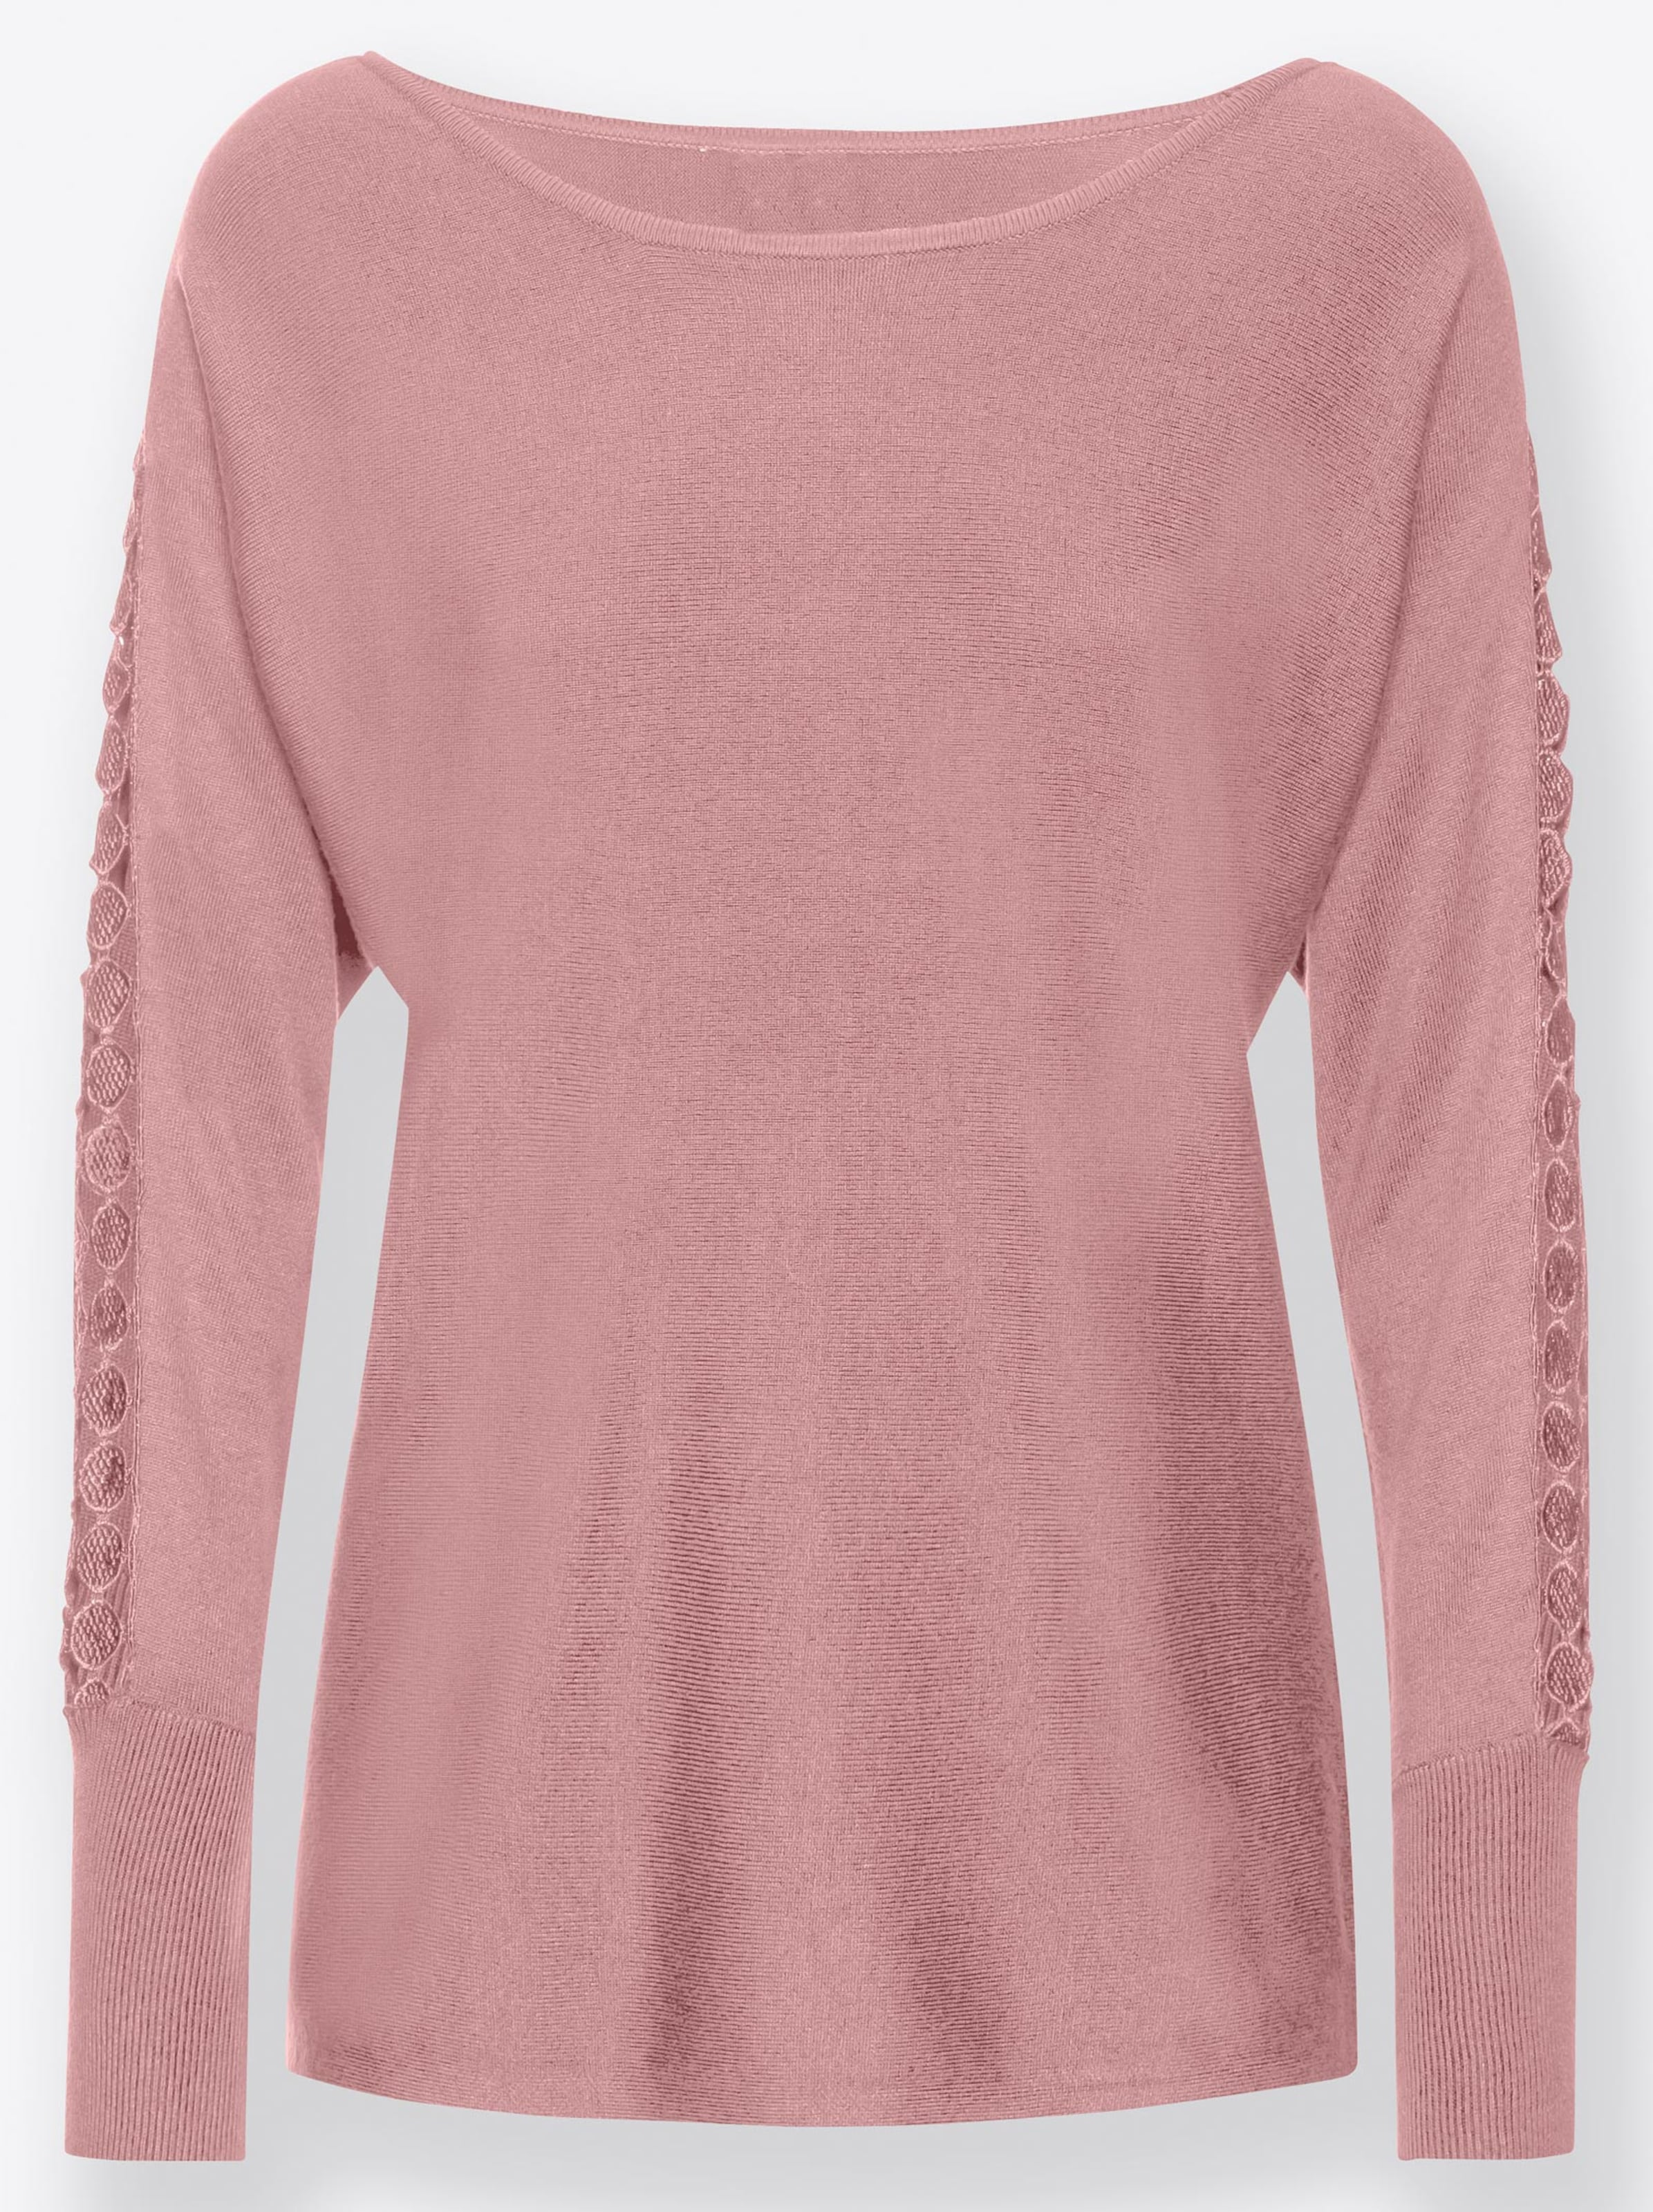 witt weiden -  Damen Pullover rosenquarz